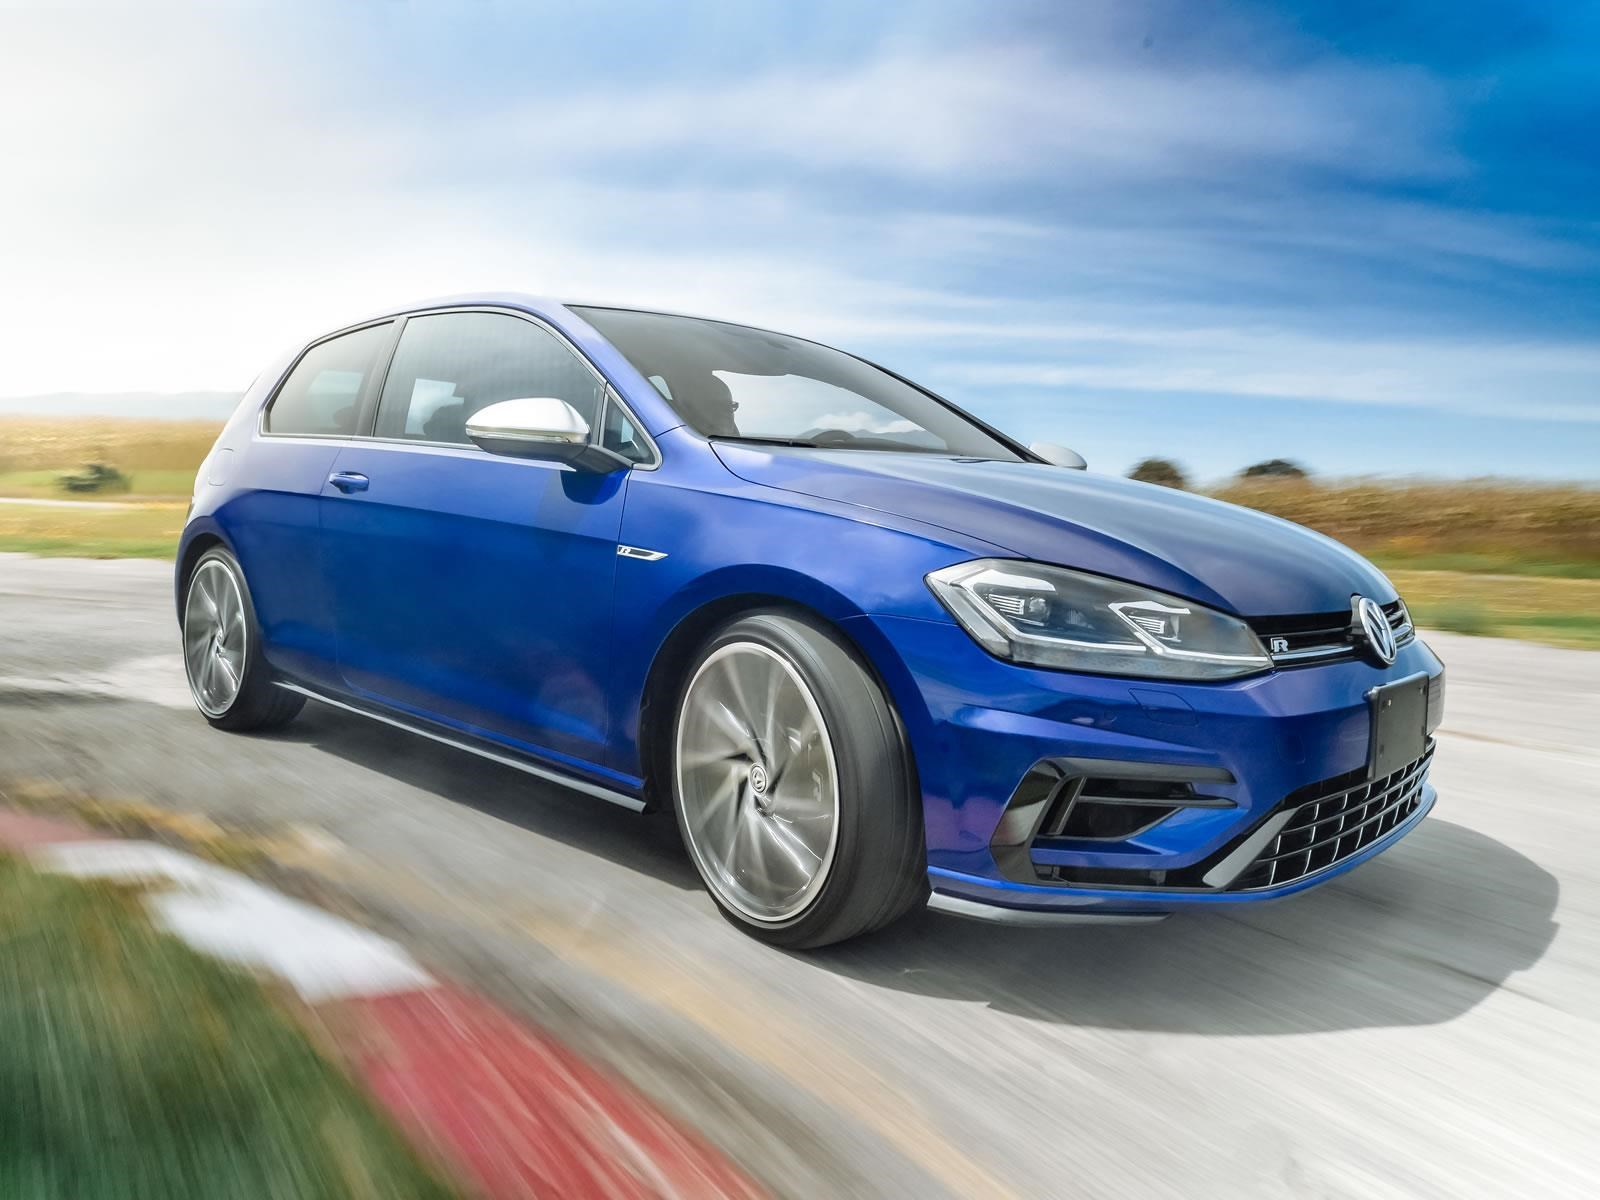 Manejamos el Volkswagen Golf R 2018